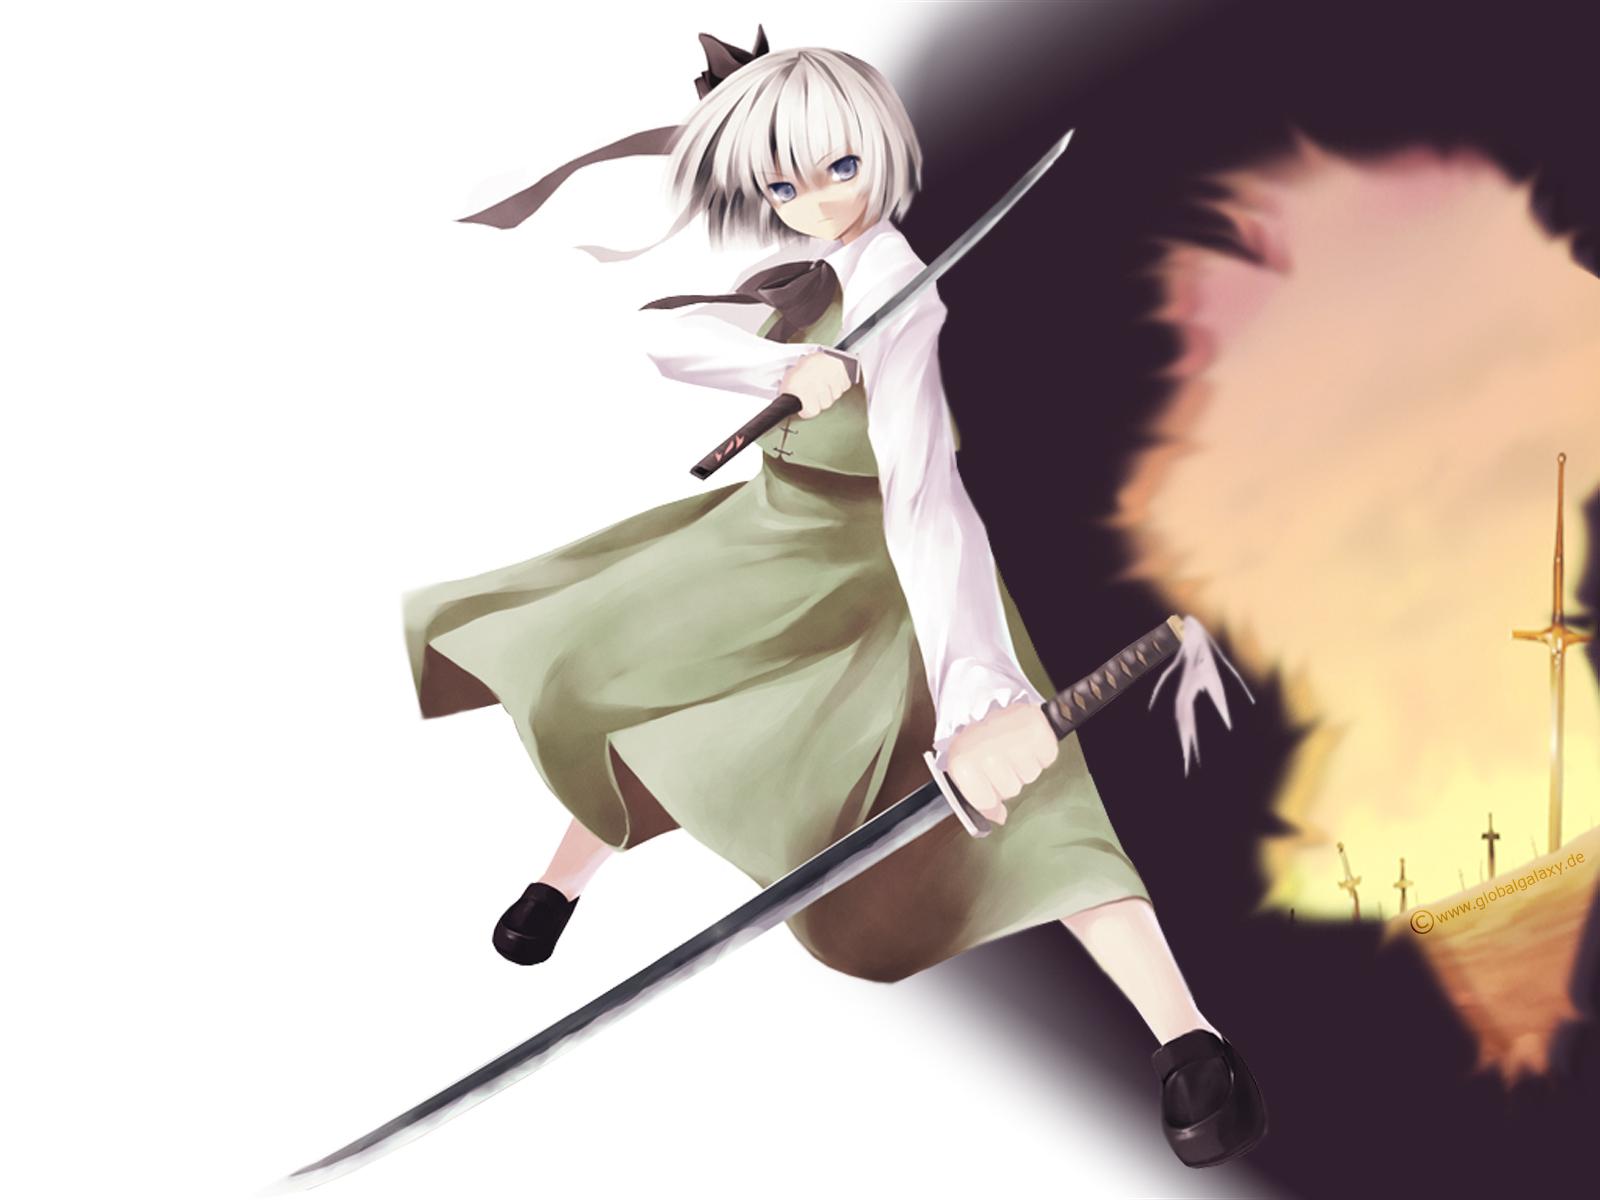 katana konpaku_youmu sword touhou weapon white_hair